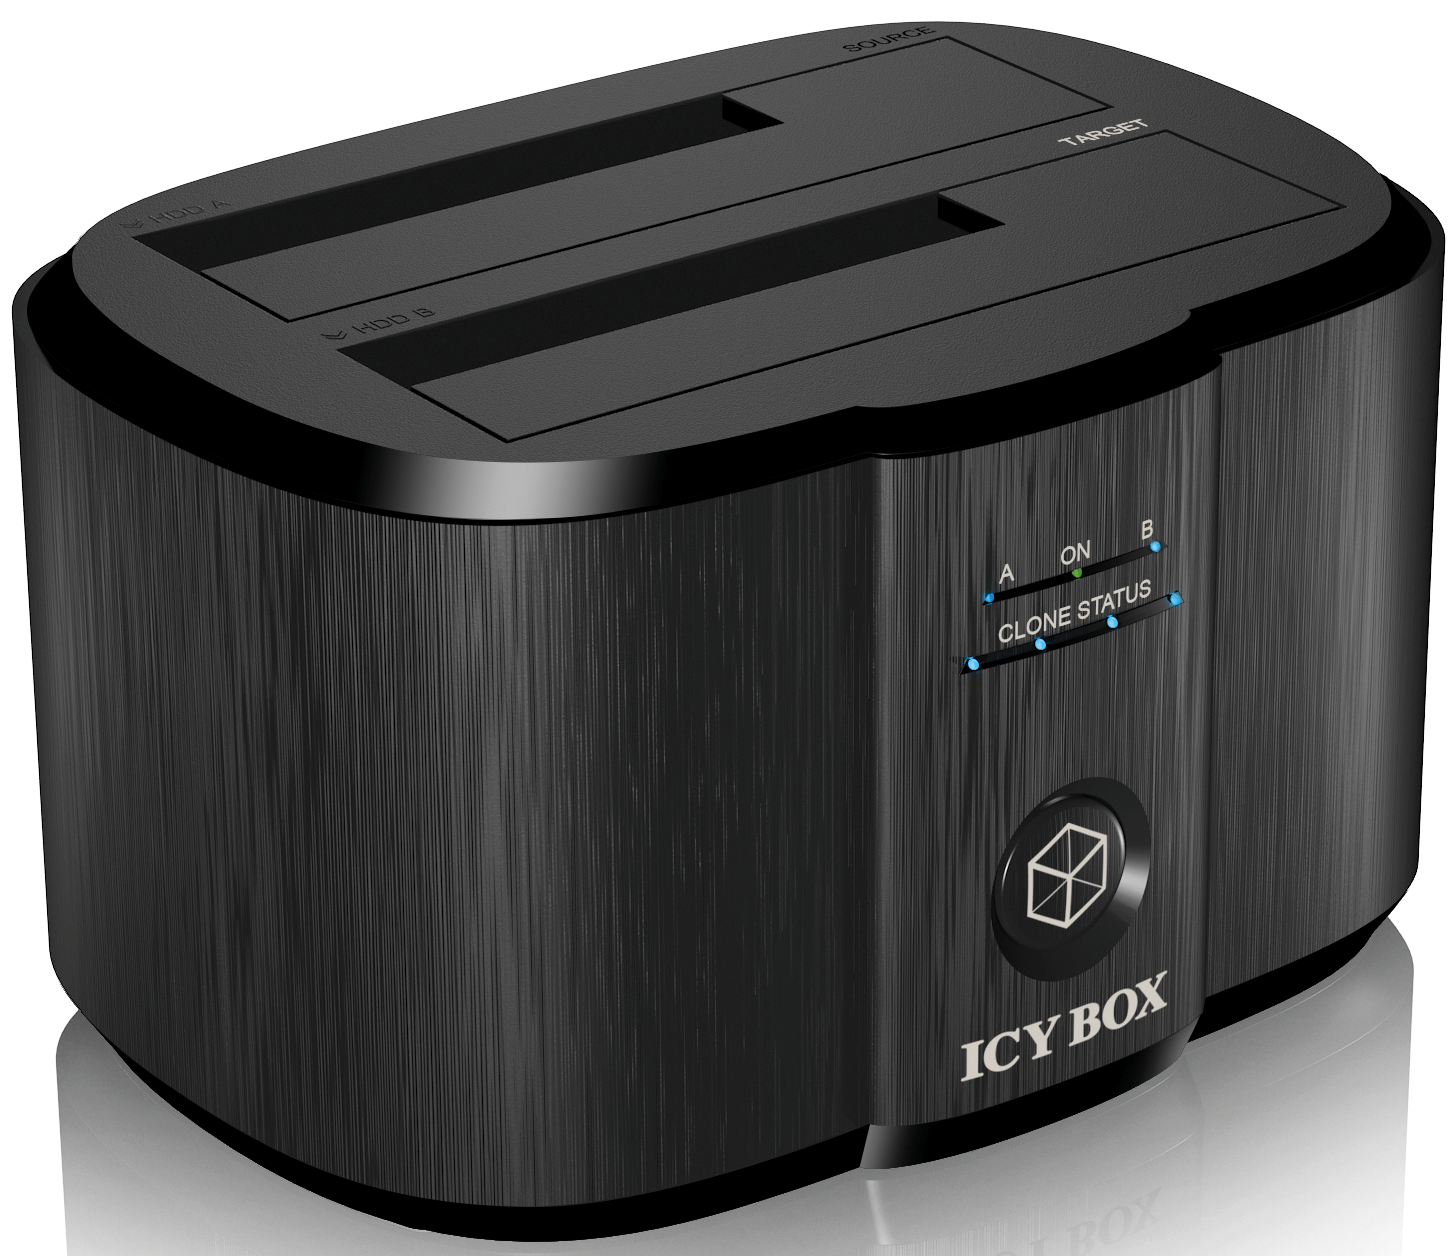 ICYBOX - USB 3.0 - S-ATA X2 - IB-124CL-U3